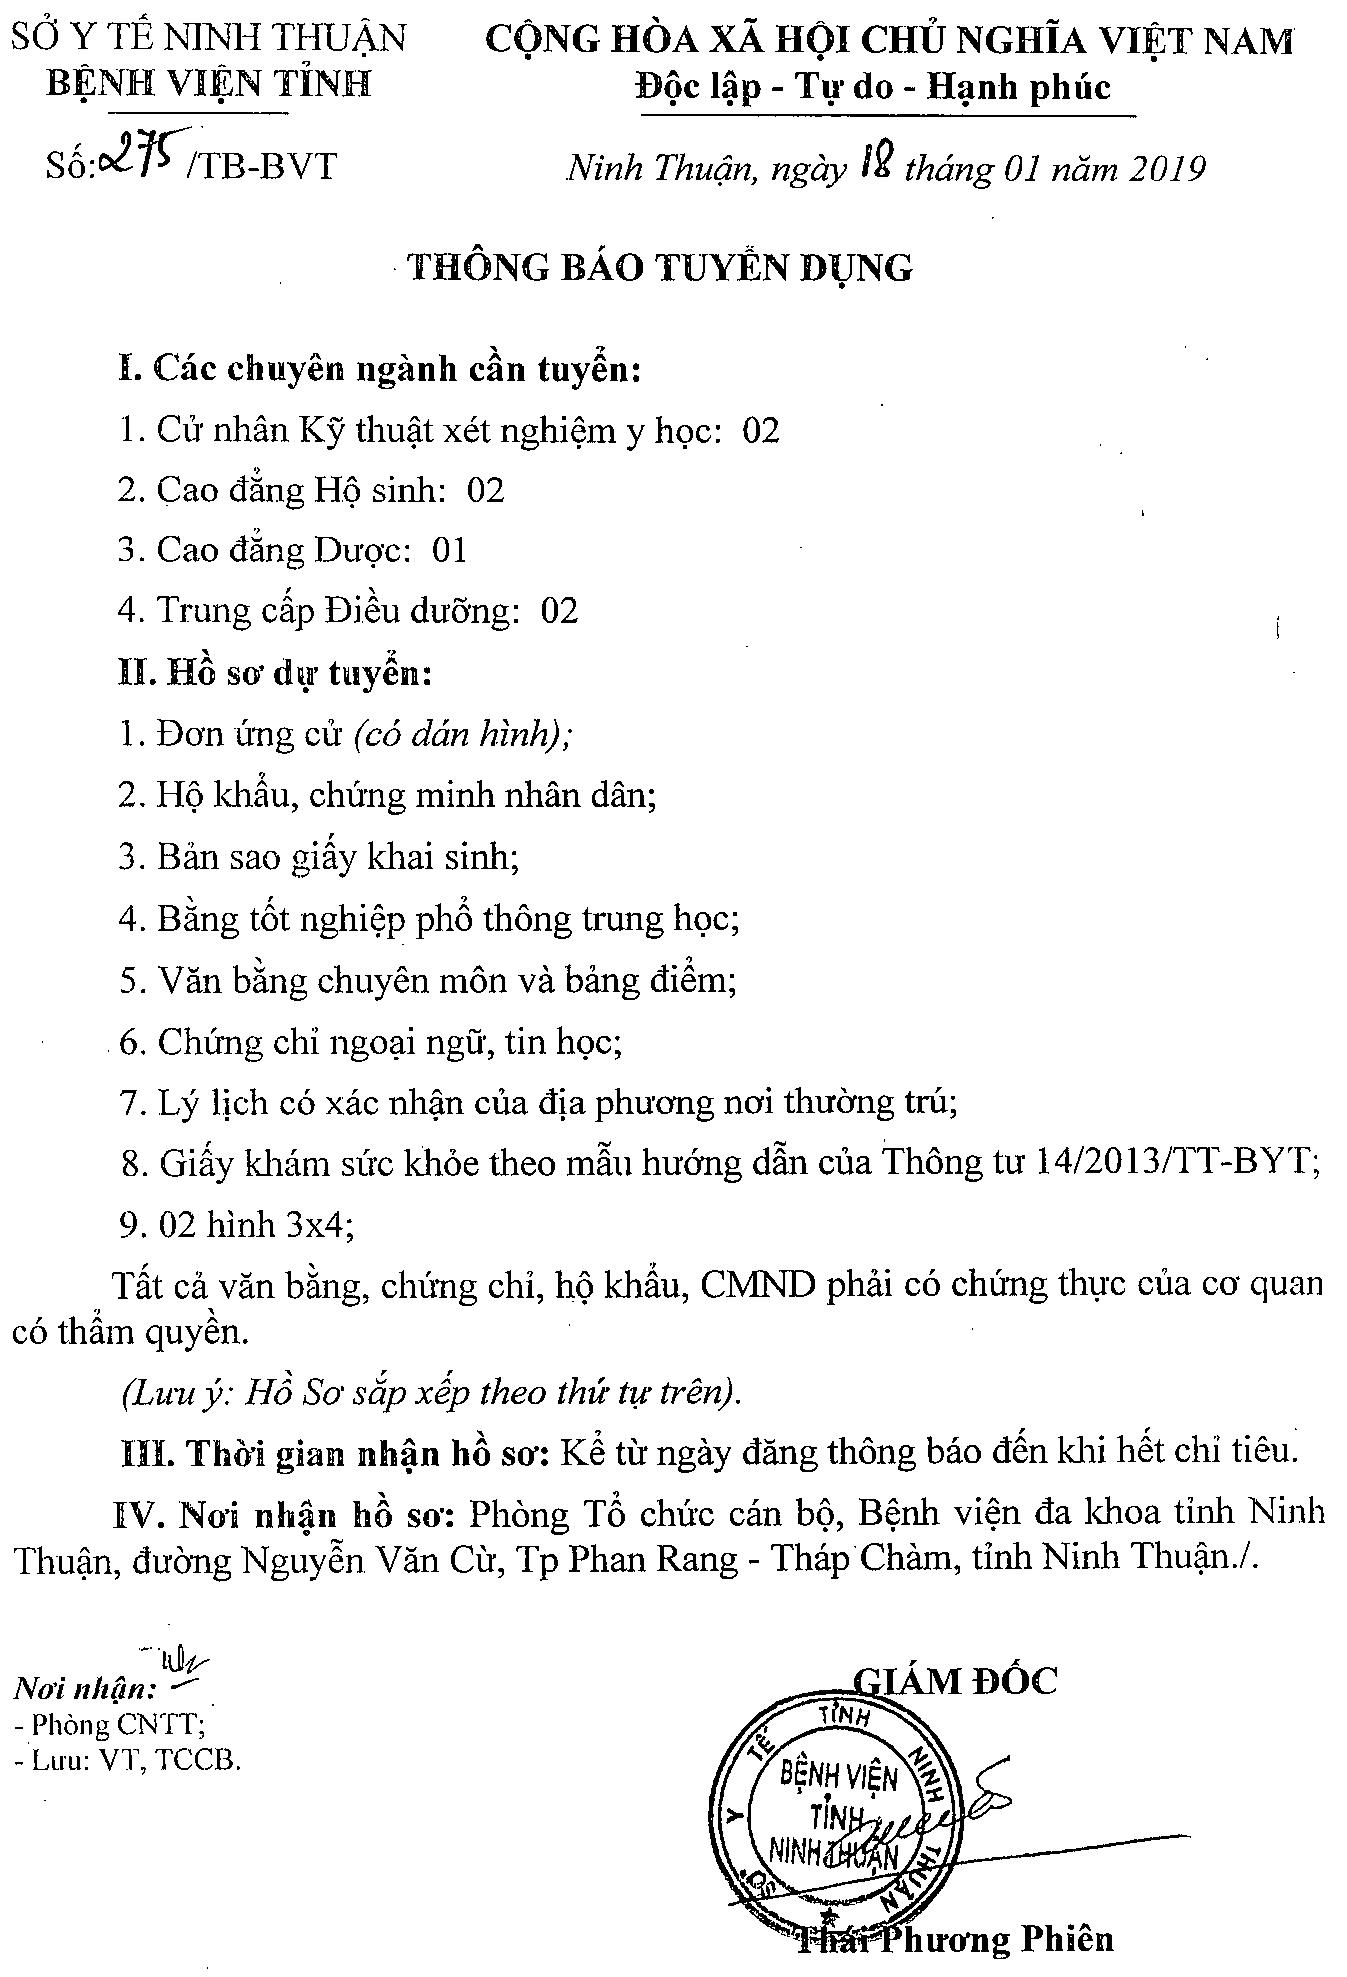 Thong bao tuyen dung thang 1 - 2019